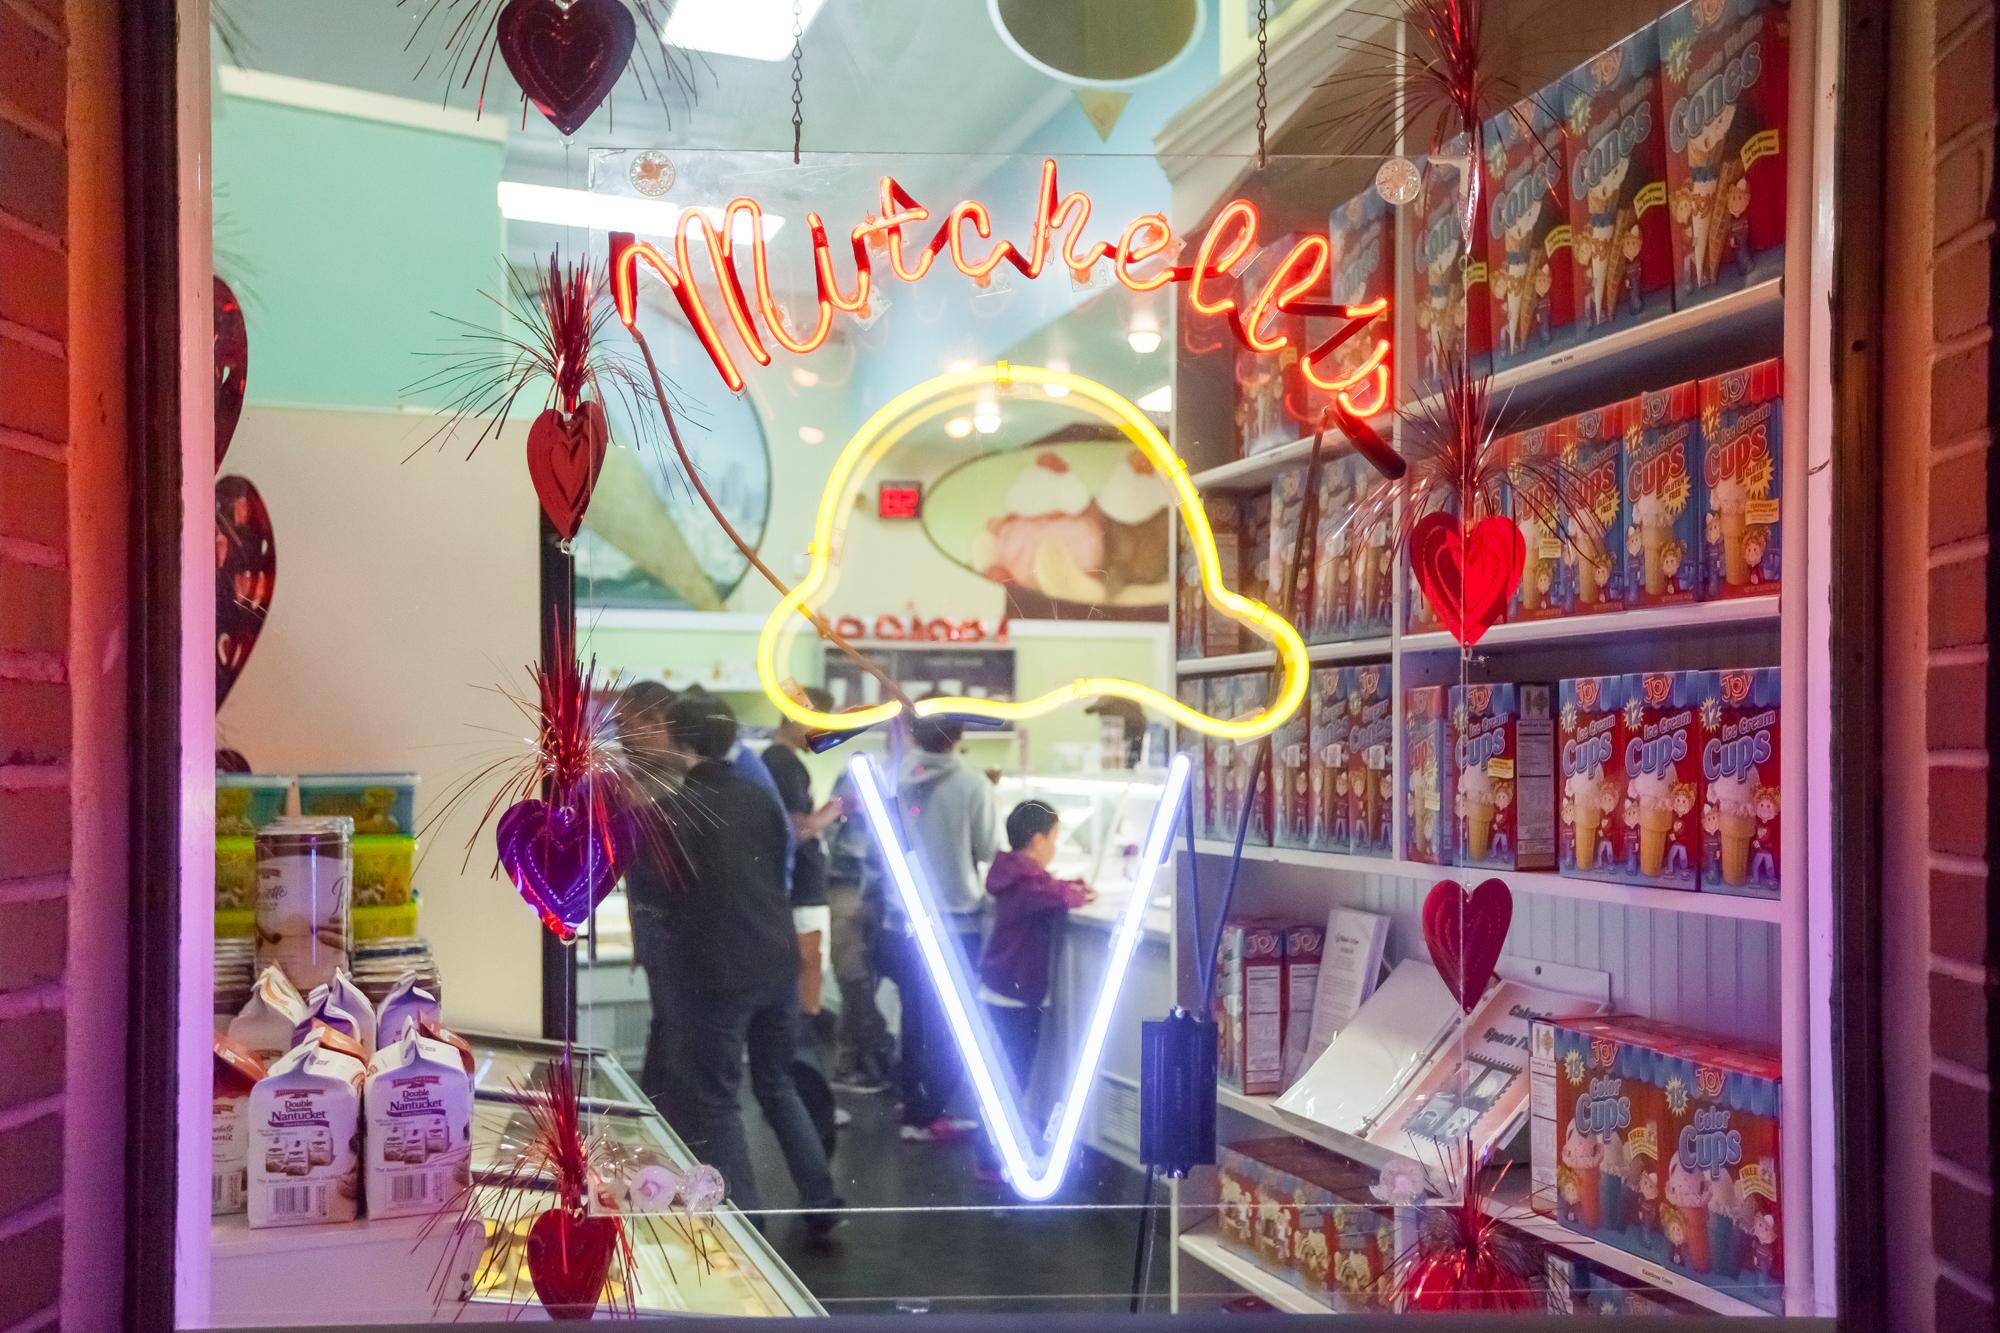 Mitchell's Ice Cream, Thursday 7:30pm